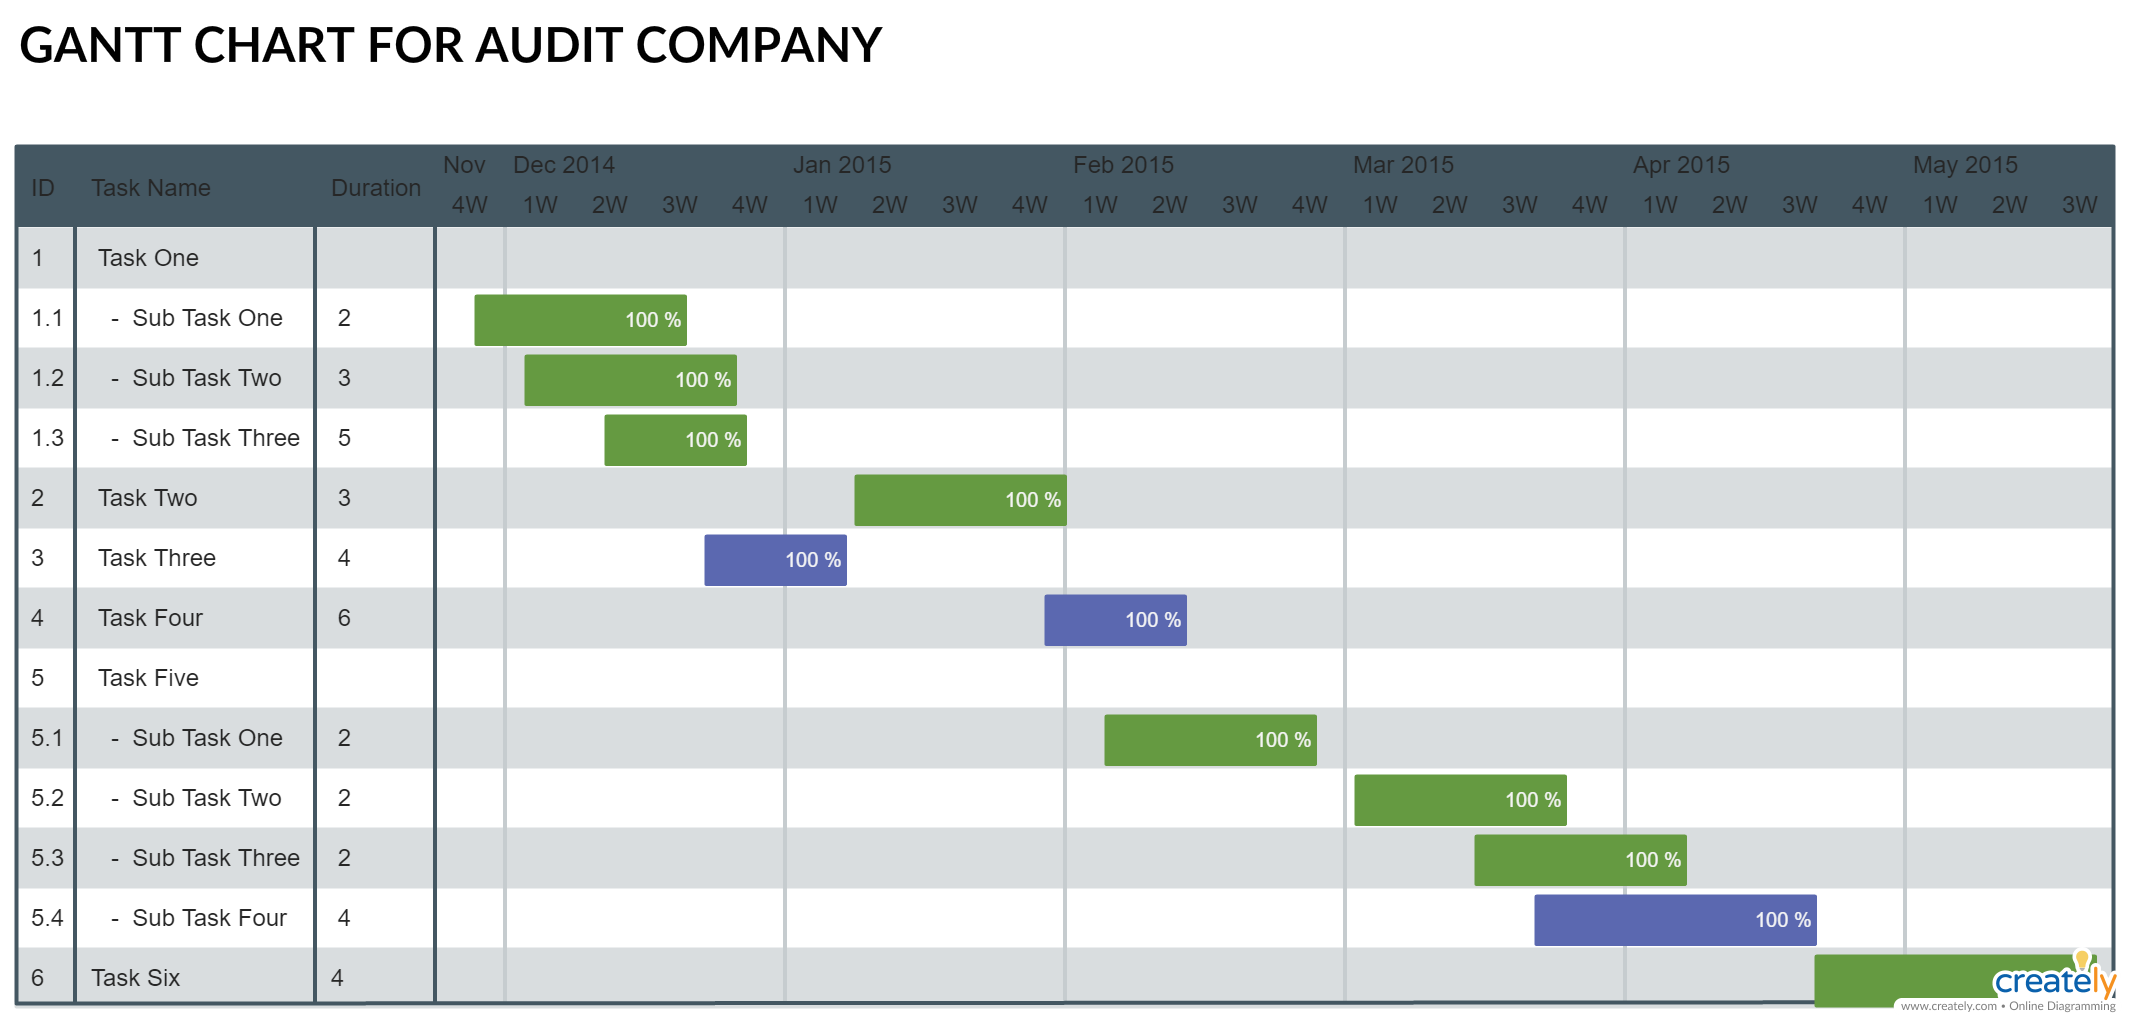 Gantt Chart For Company Audit Gantt Chart Template For A Audit